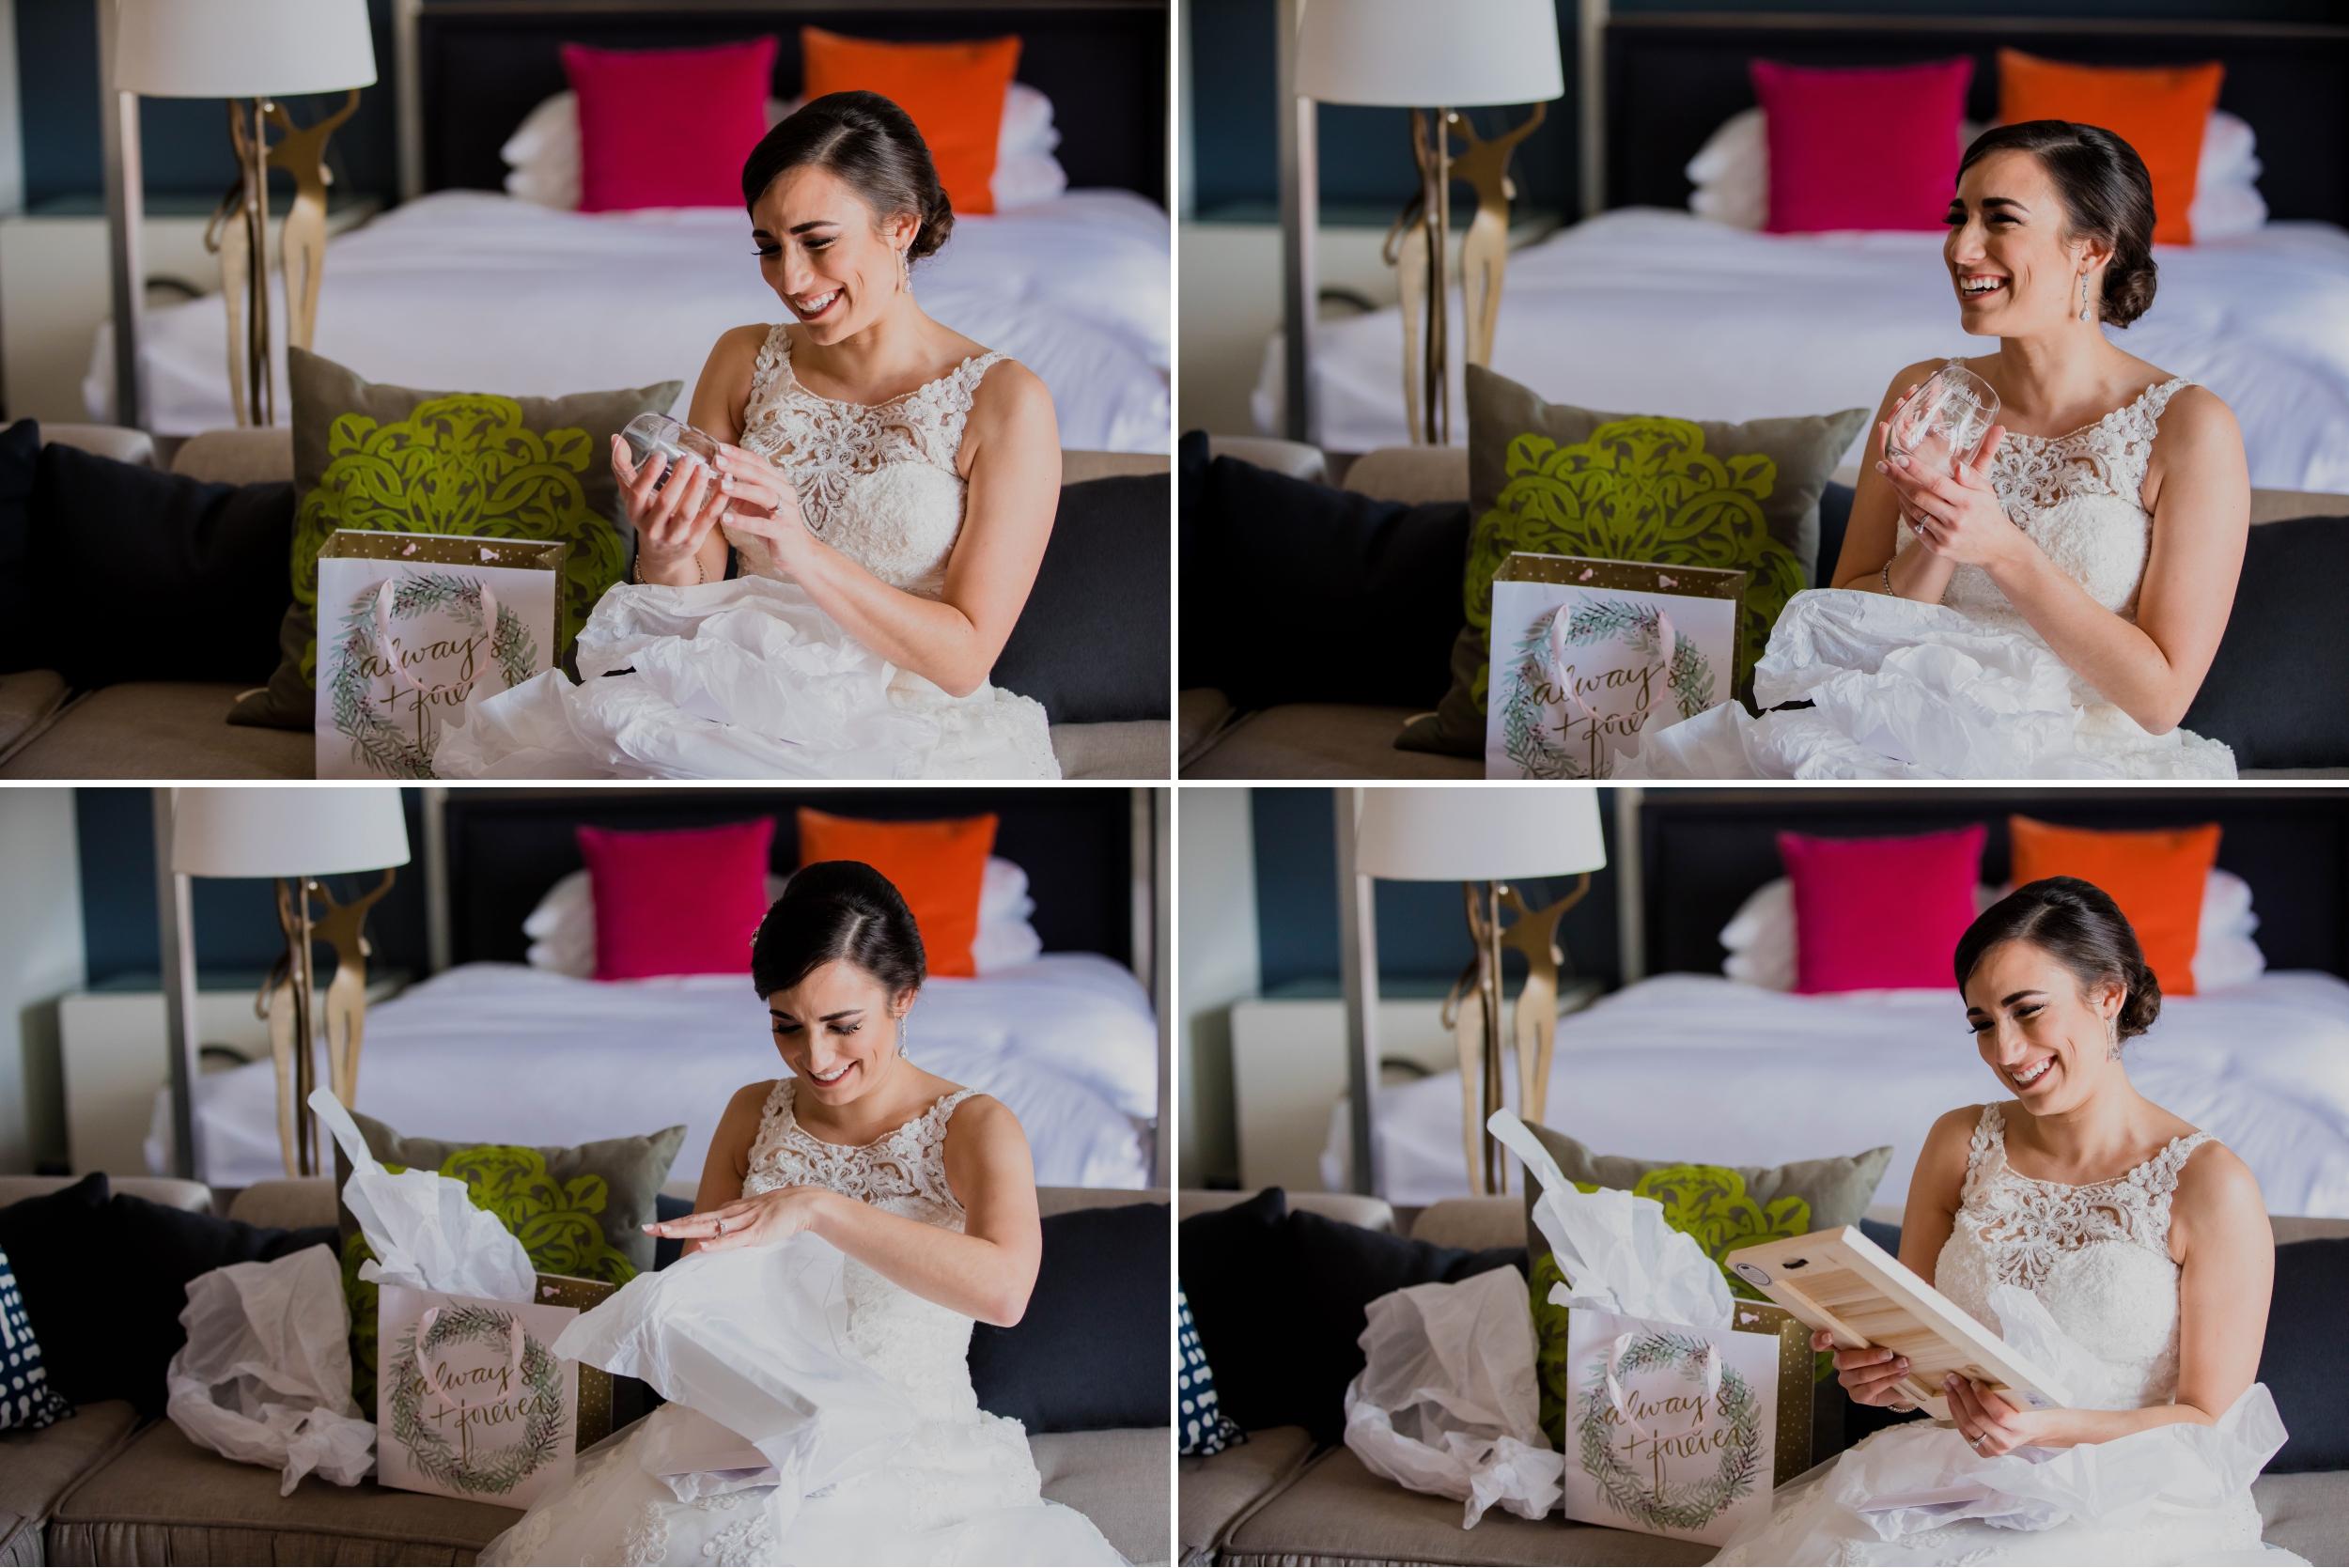 Wedding Hotel Colonnade Coral Gables - Santy Martinez 10.jpg